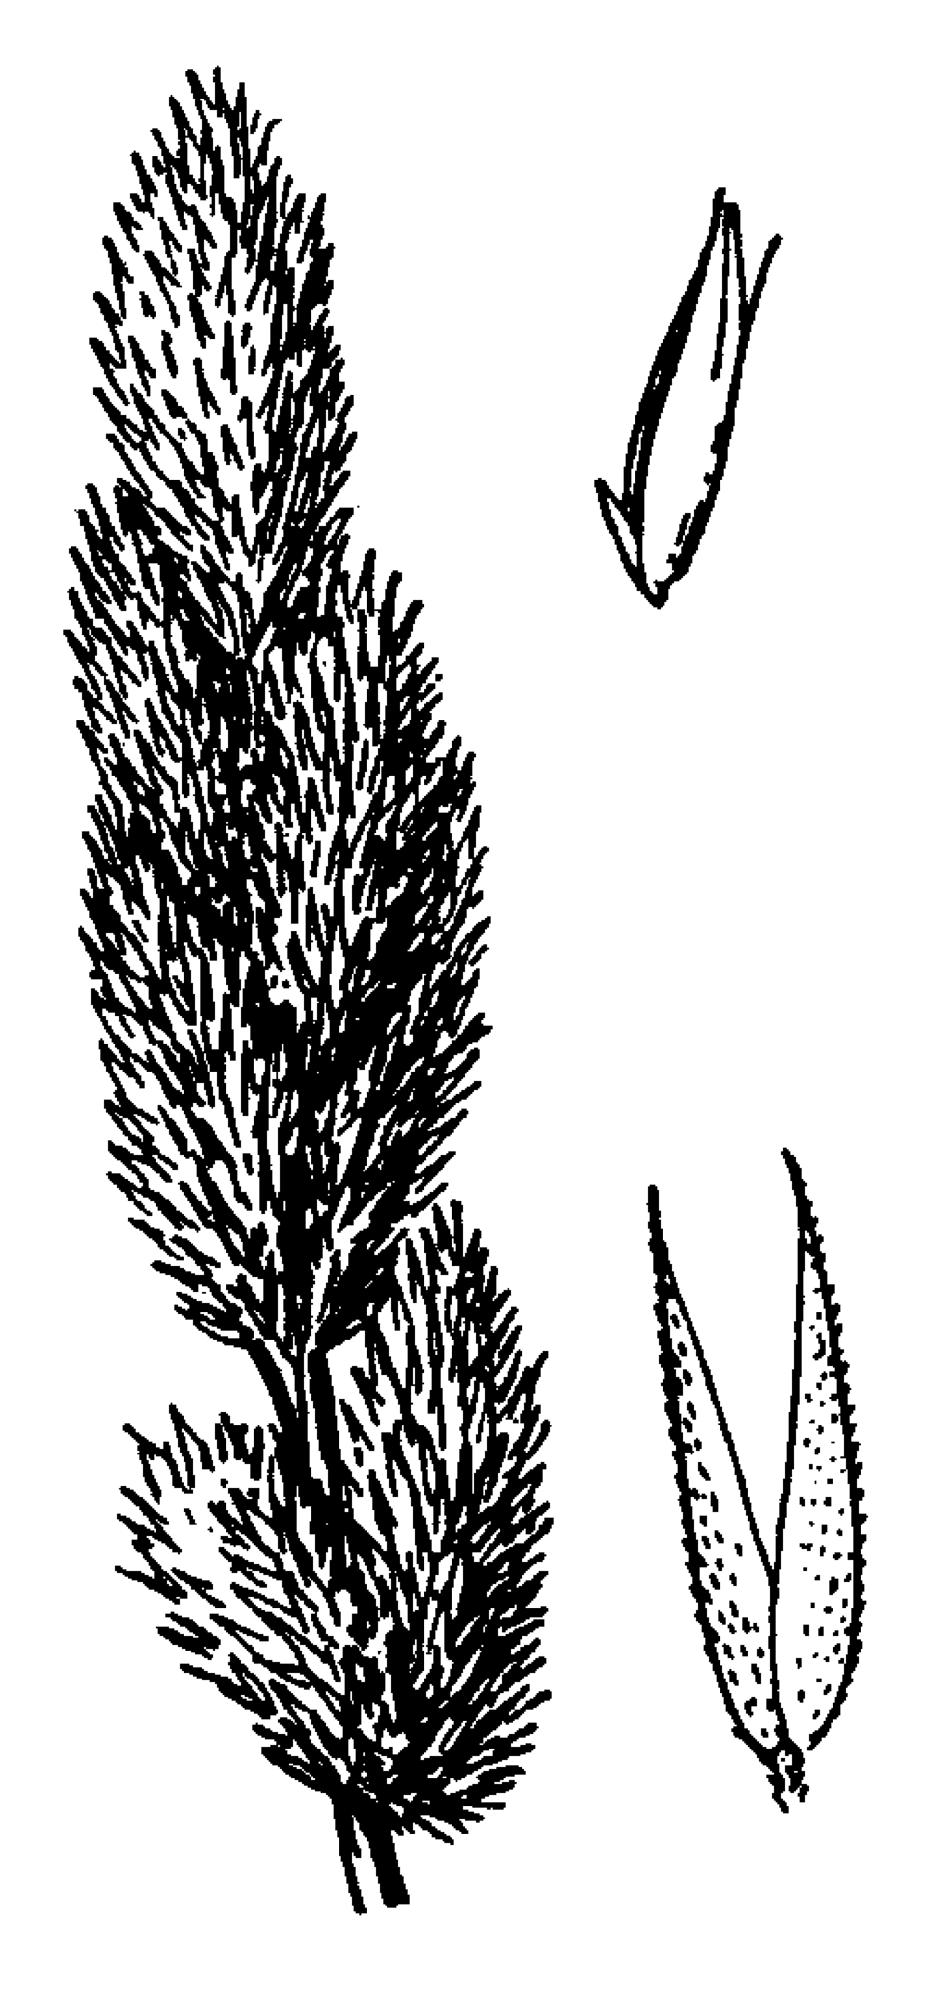 Agrostis Densiflora Wikipedia